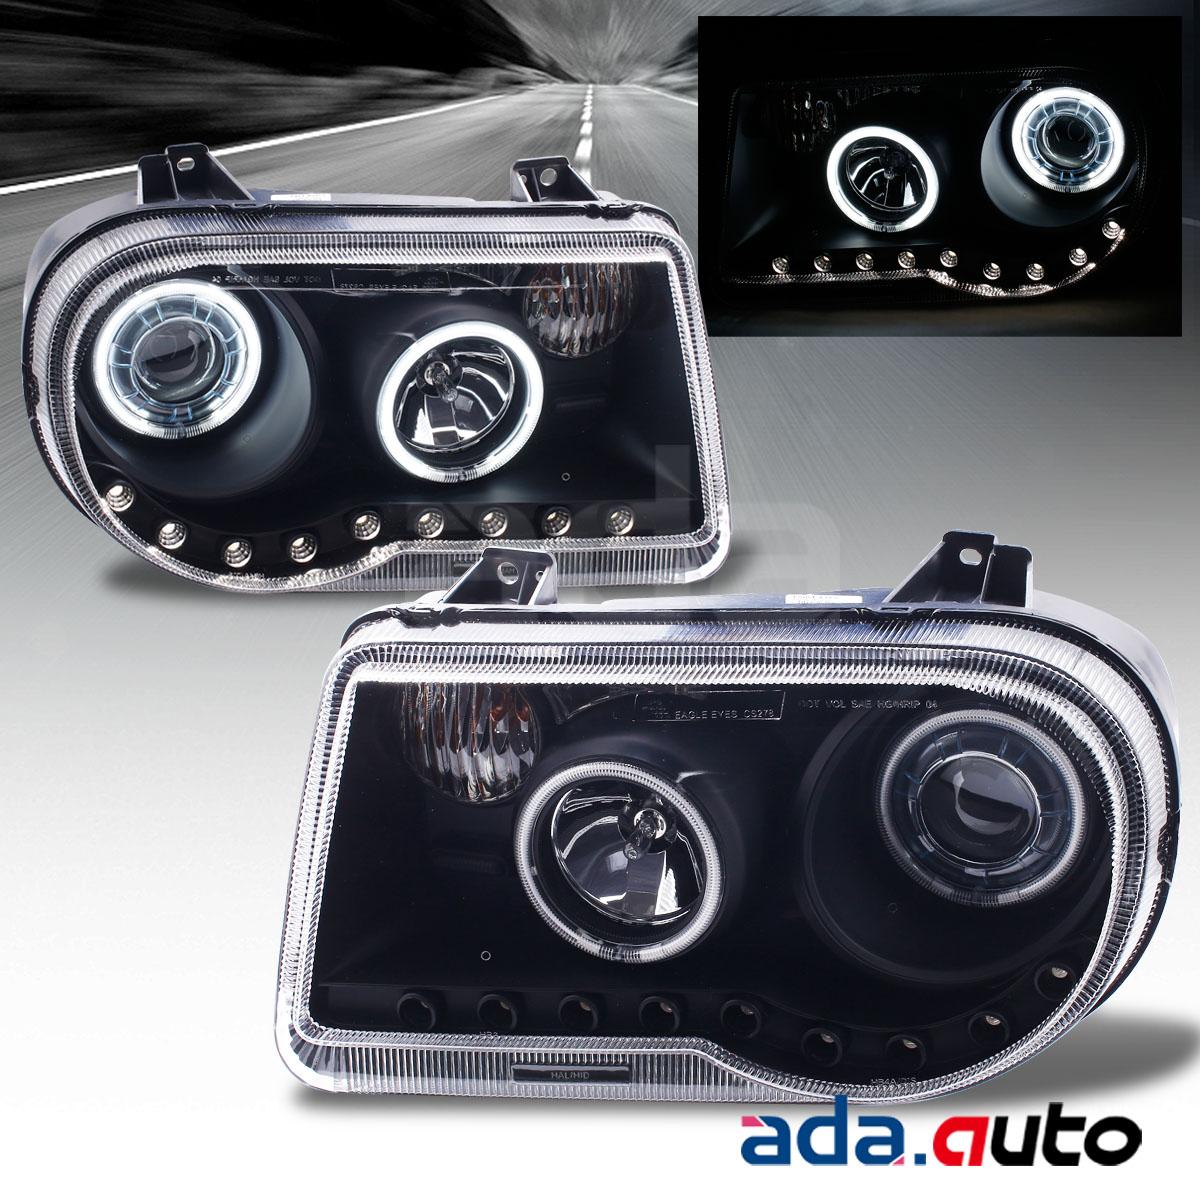 2005 2006 2007 Chrysler 300c Srt8 Clear Black Headlights: 2005-2010 Chrysler 300C [Dual CCFL Halo] Projector LED DRL